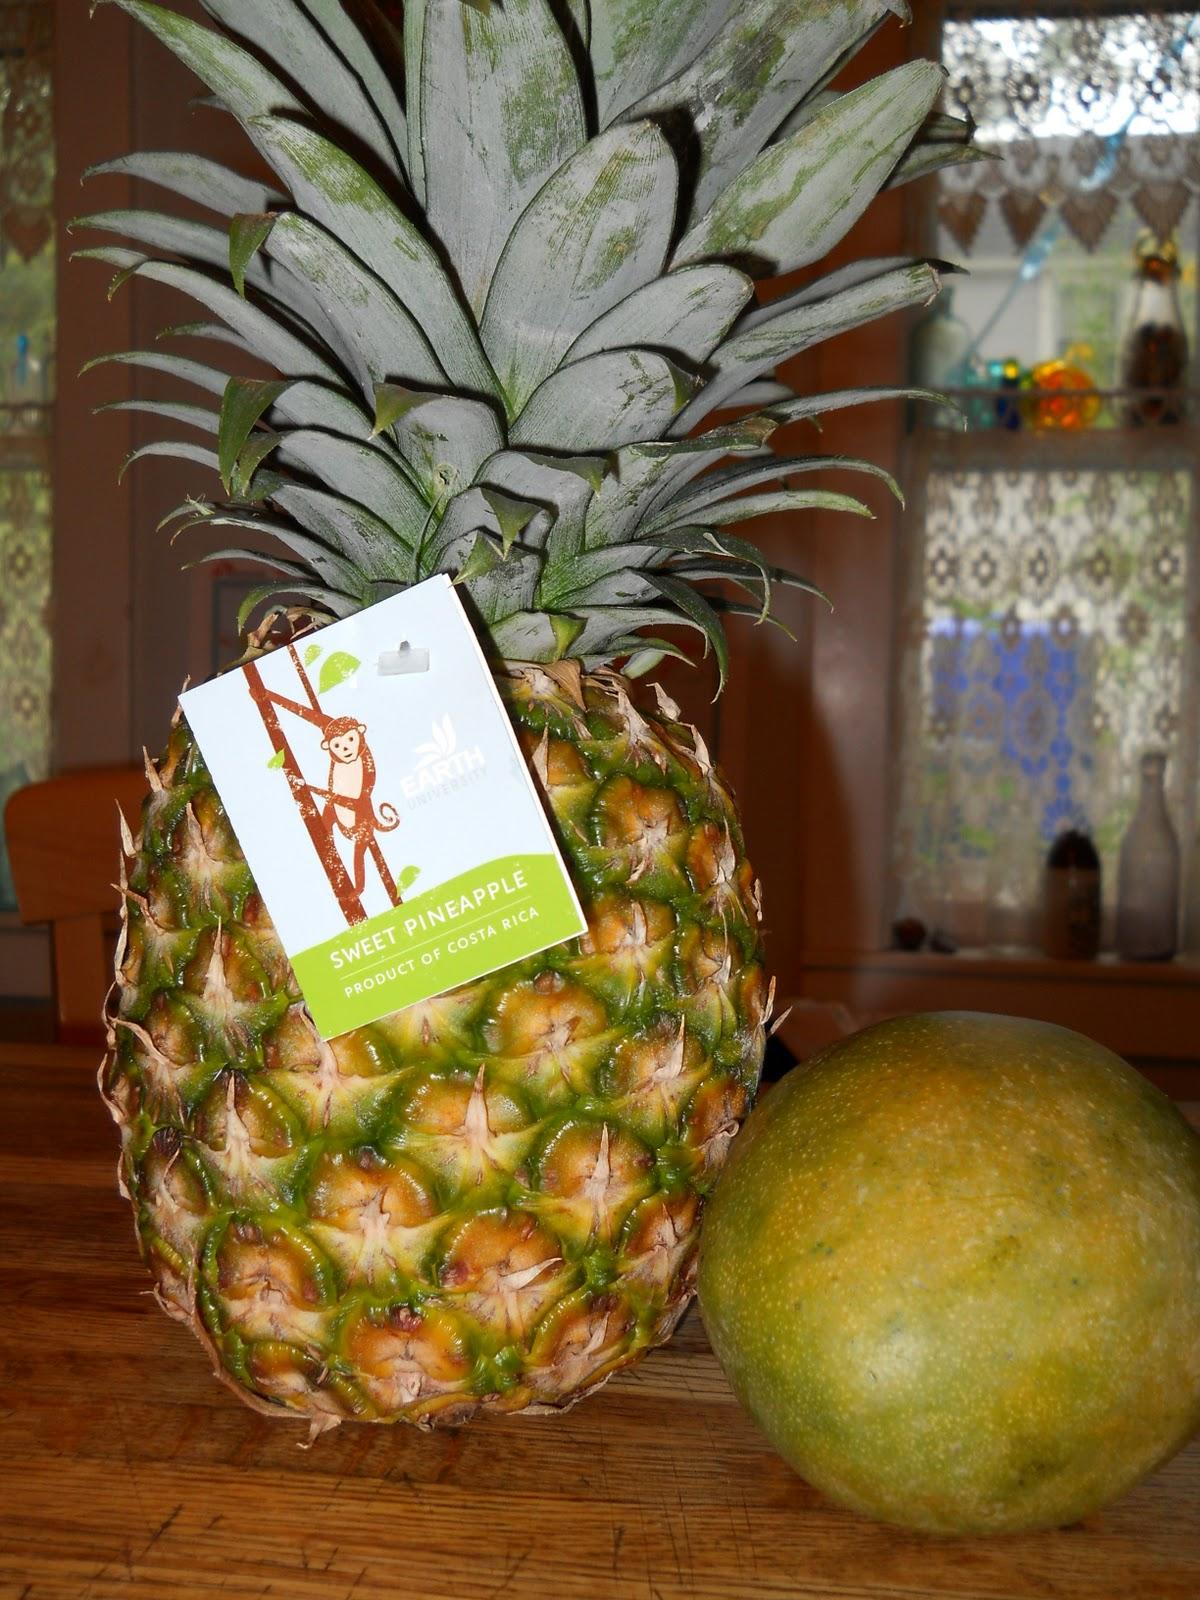 http://3.bp.blogspot.com/_wY6ZjnmSrGE/TFS6aWrDHEI/AAAAAAAABaI/K8rzkGIKTg8/s1600/Costa%2BRica%2B020.JPG